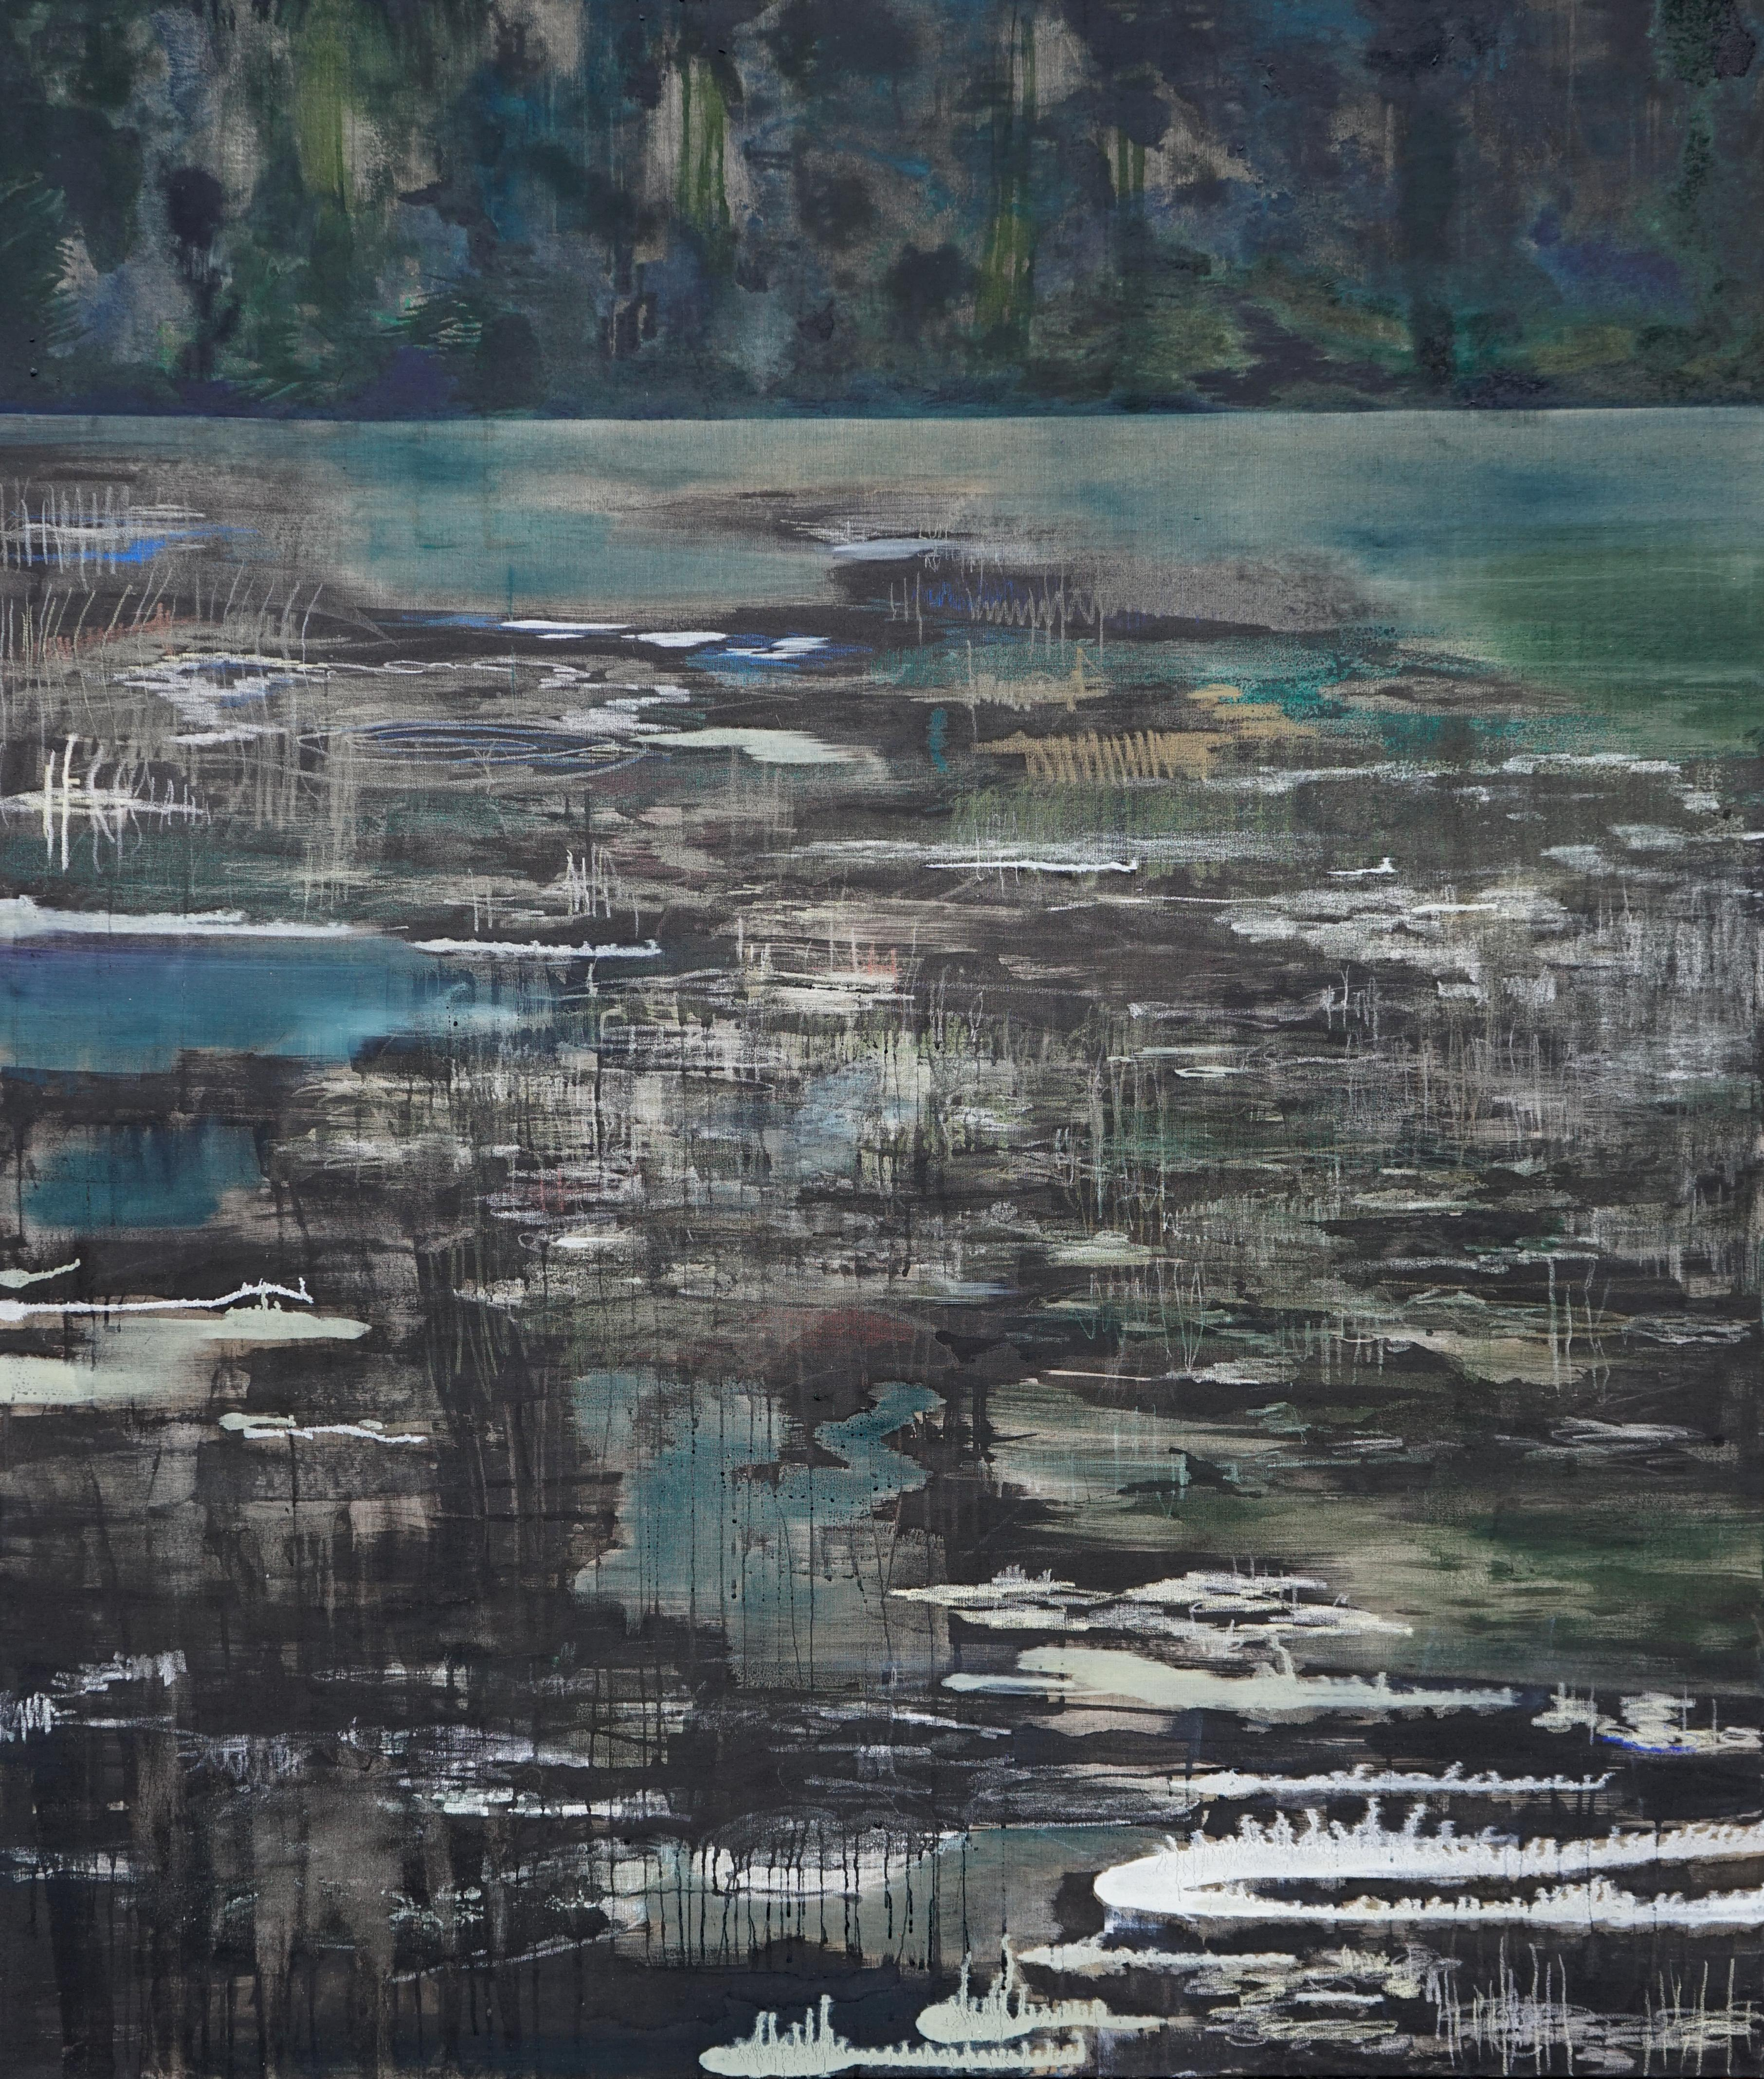 River Bend - Large Format Contemporary Nature Painting, Landscape